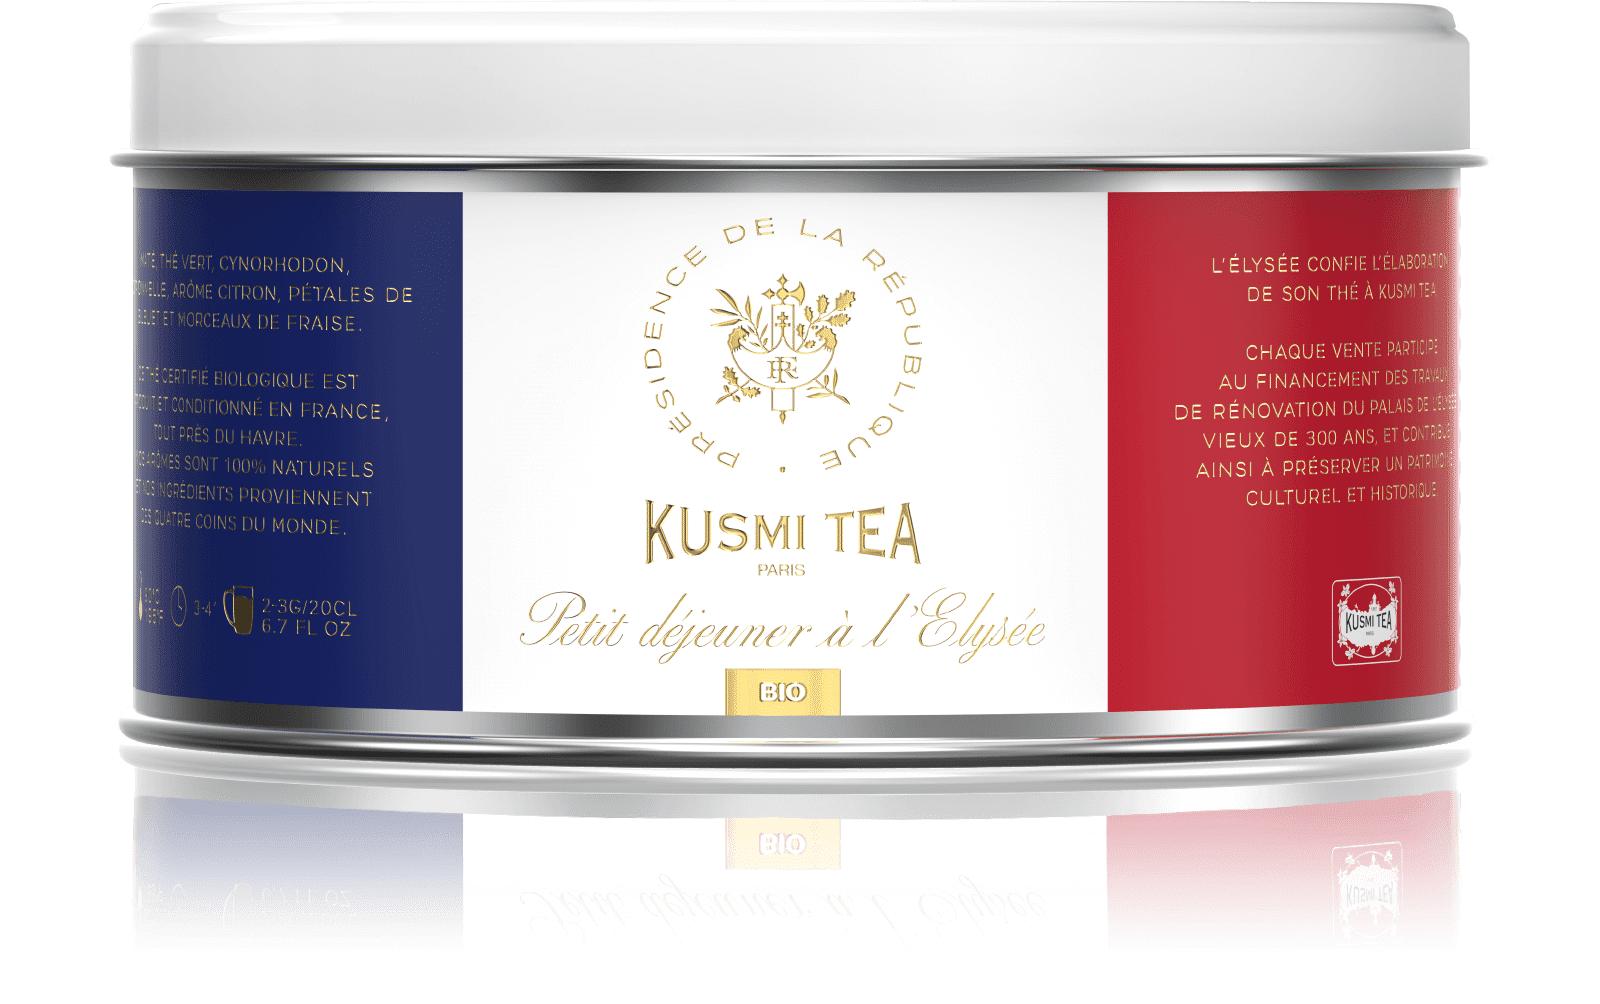 KUSMI TEA Petit déjeuner à l'Elysée bio - Thé vert, maté, citron - Boîte de thé en vrac - Kusmi Tea